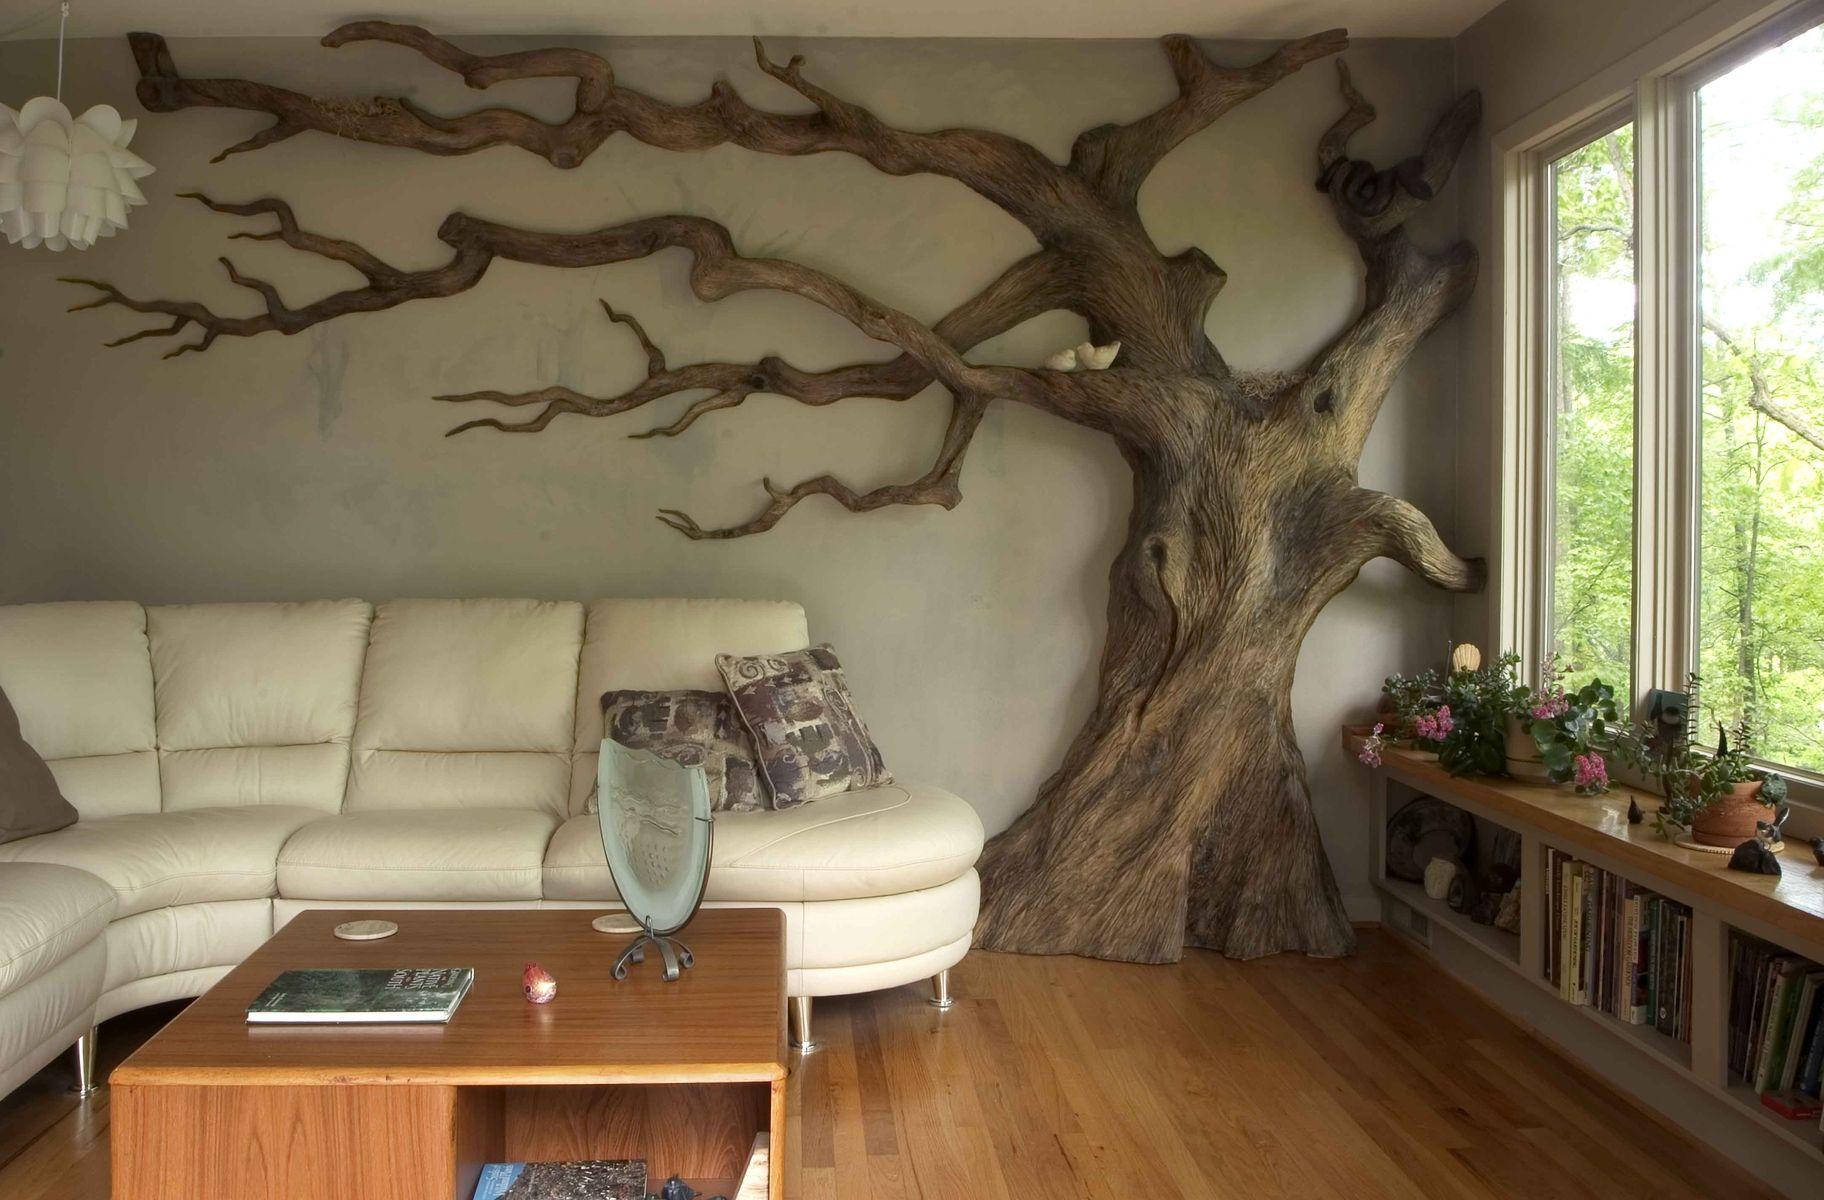 Carved Tree Decoration For Your Rpg Den